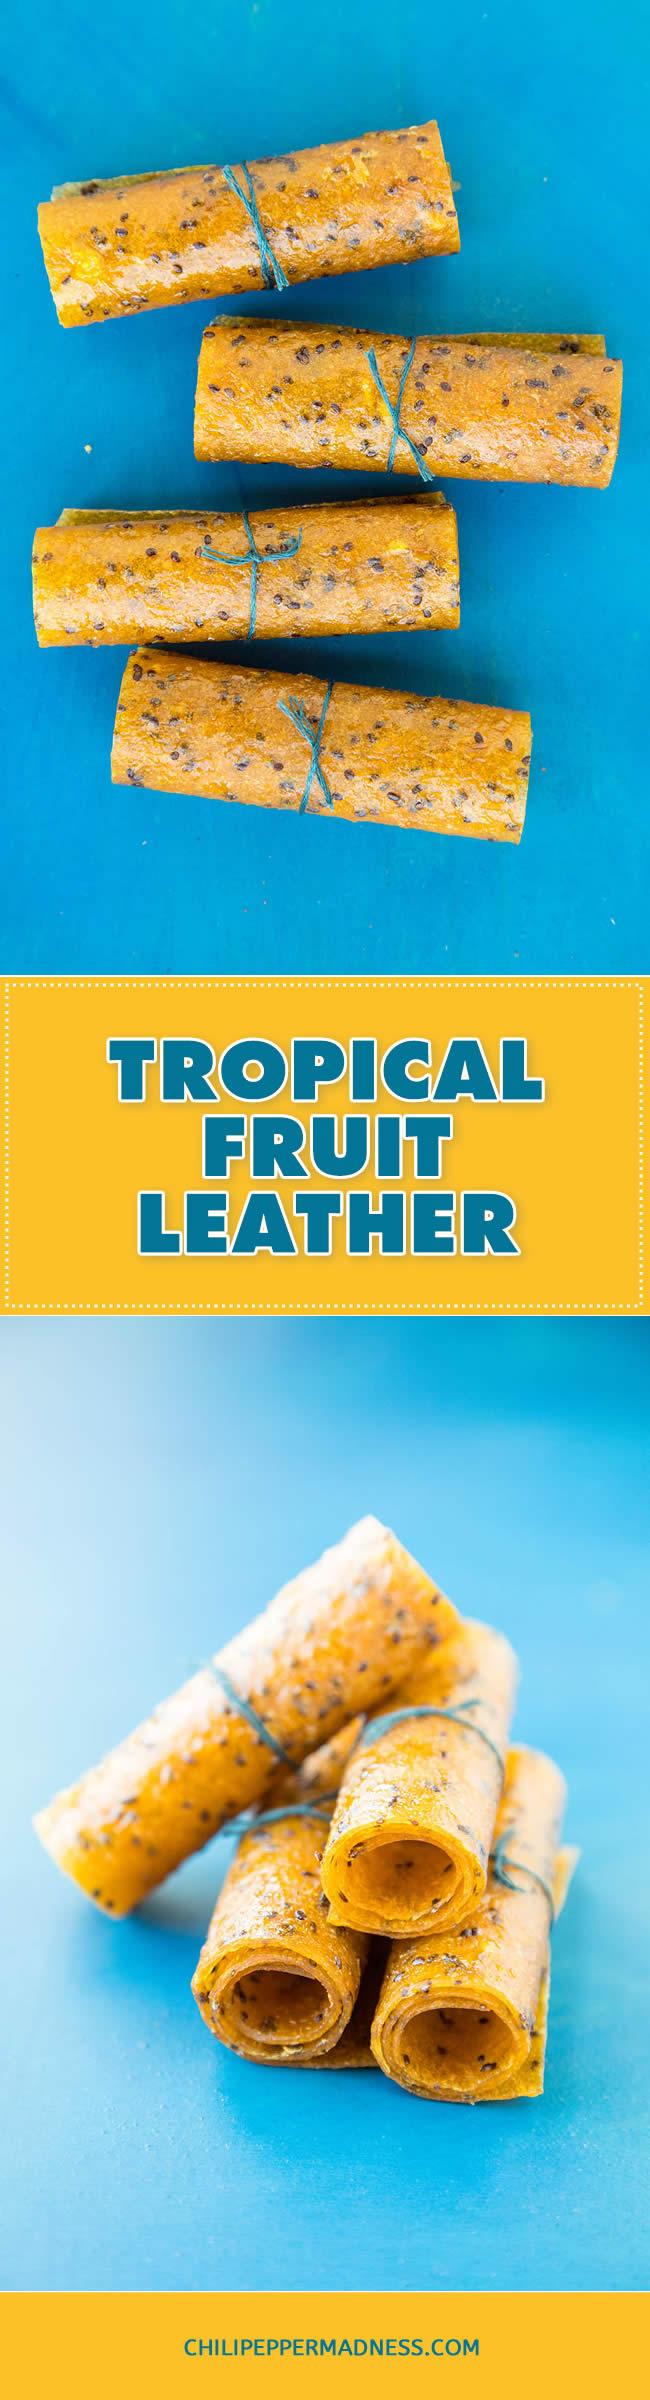 Tropical Fruit Leather/Fruit Rollups - Recipe | ChiliPepperMadness.com #homemadesnacks #homemadecandy #dehydrator #snacks